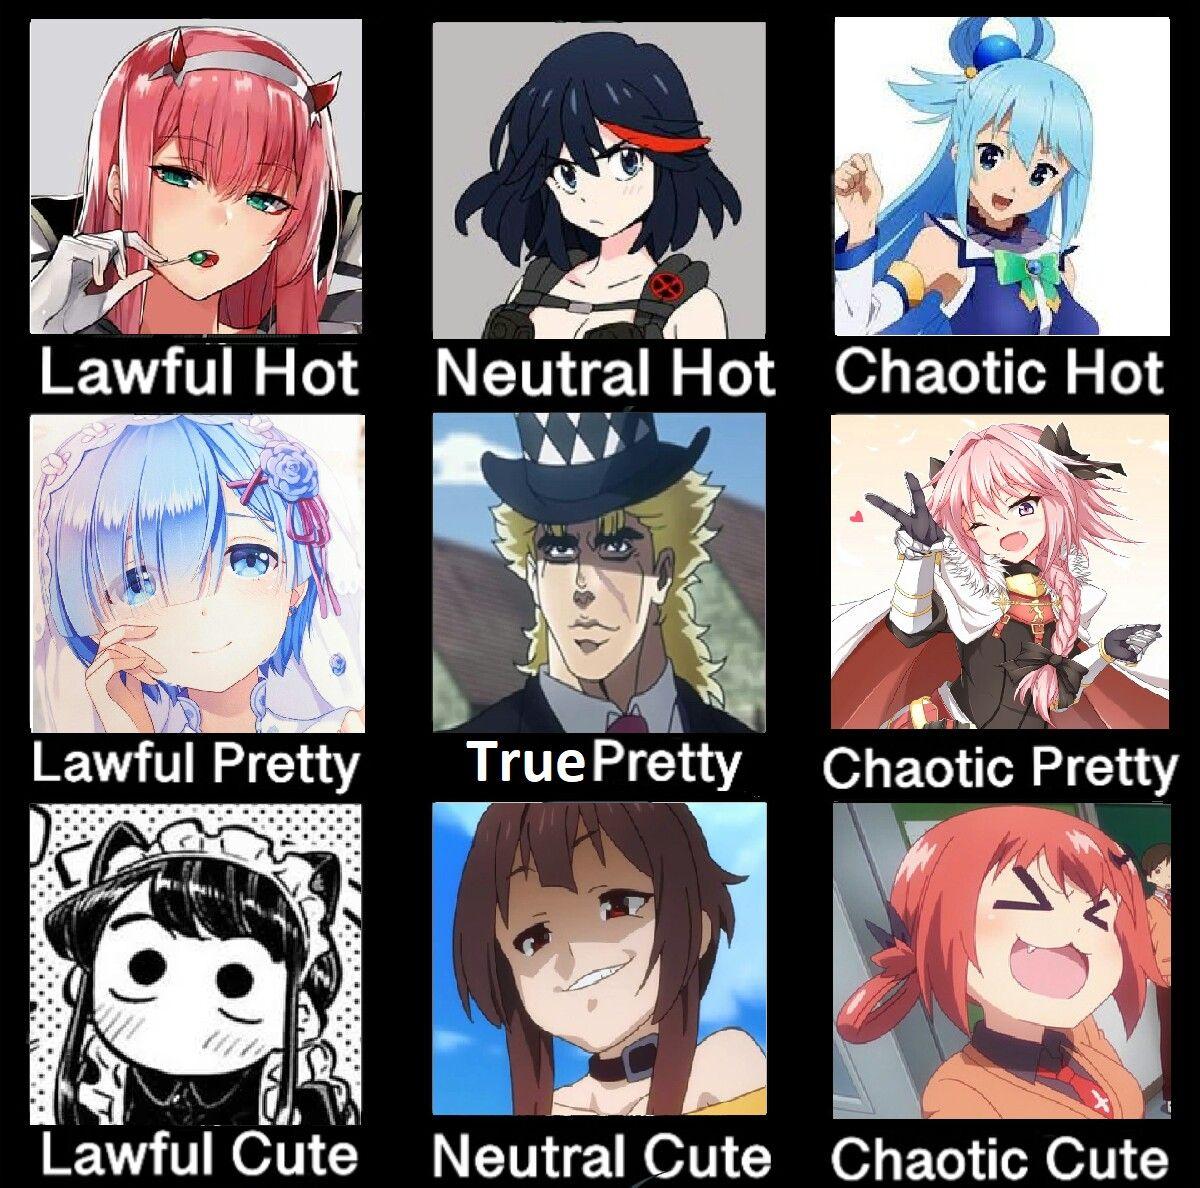 Pin by Kavin Muller on Anime Anime, Anime memes, Anime funny